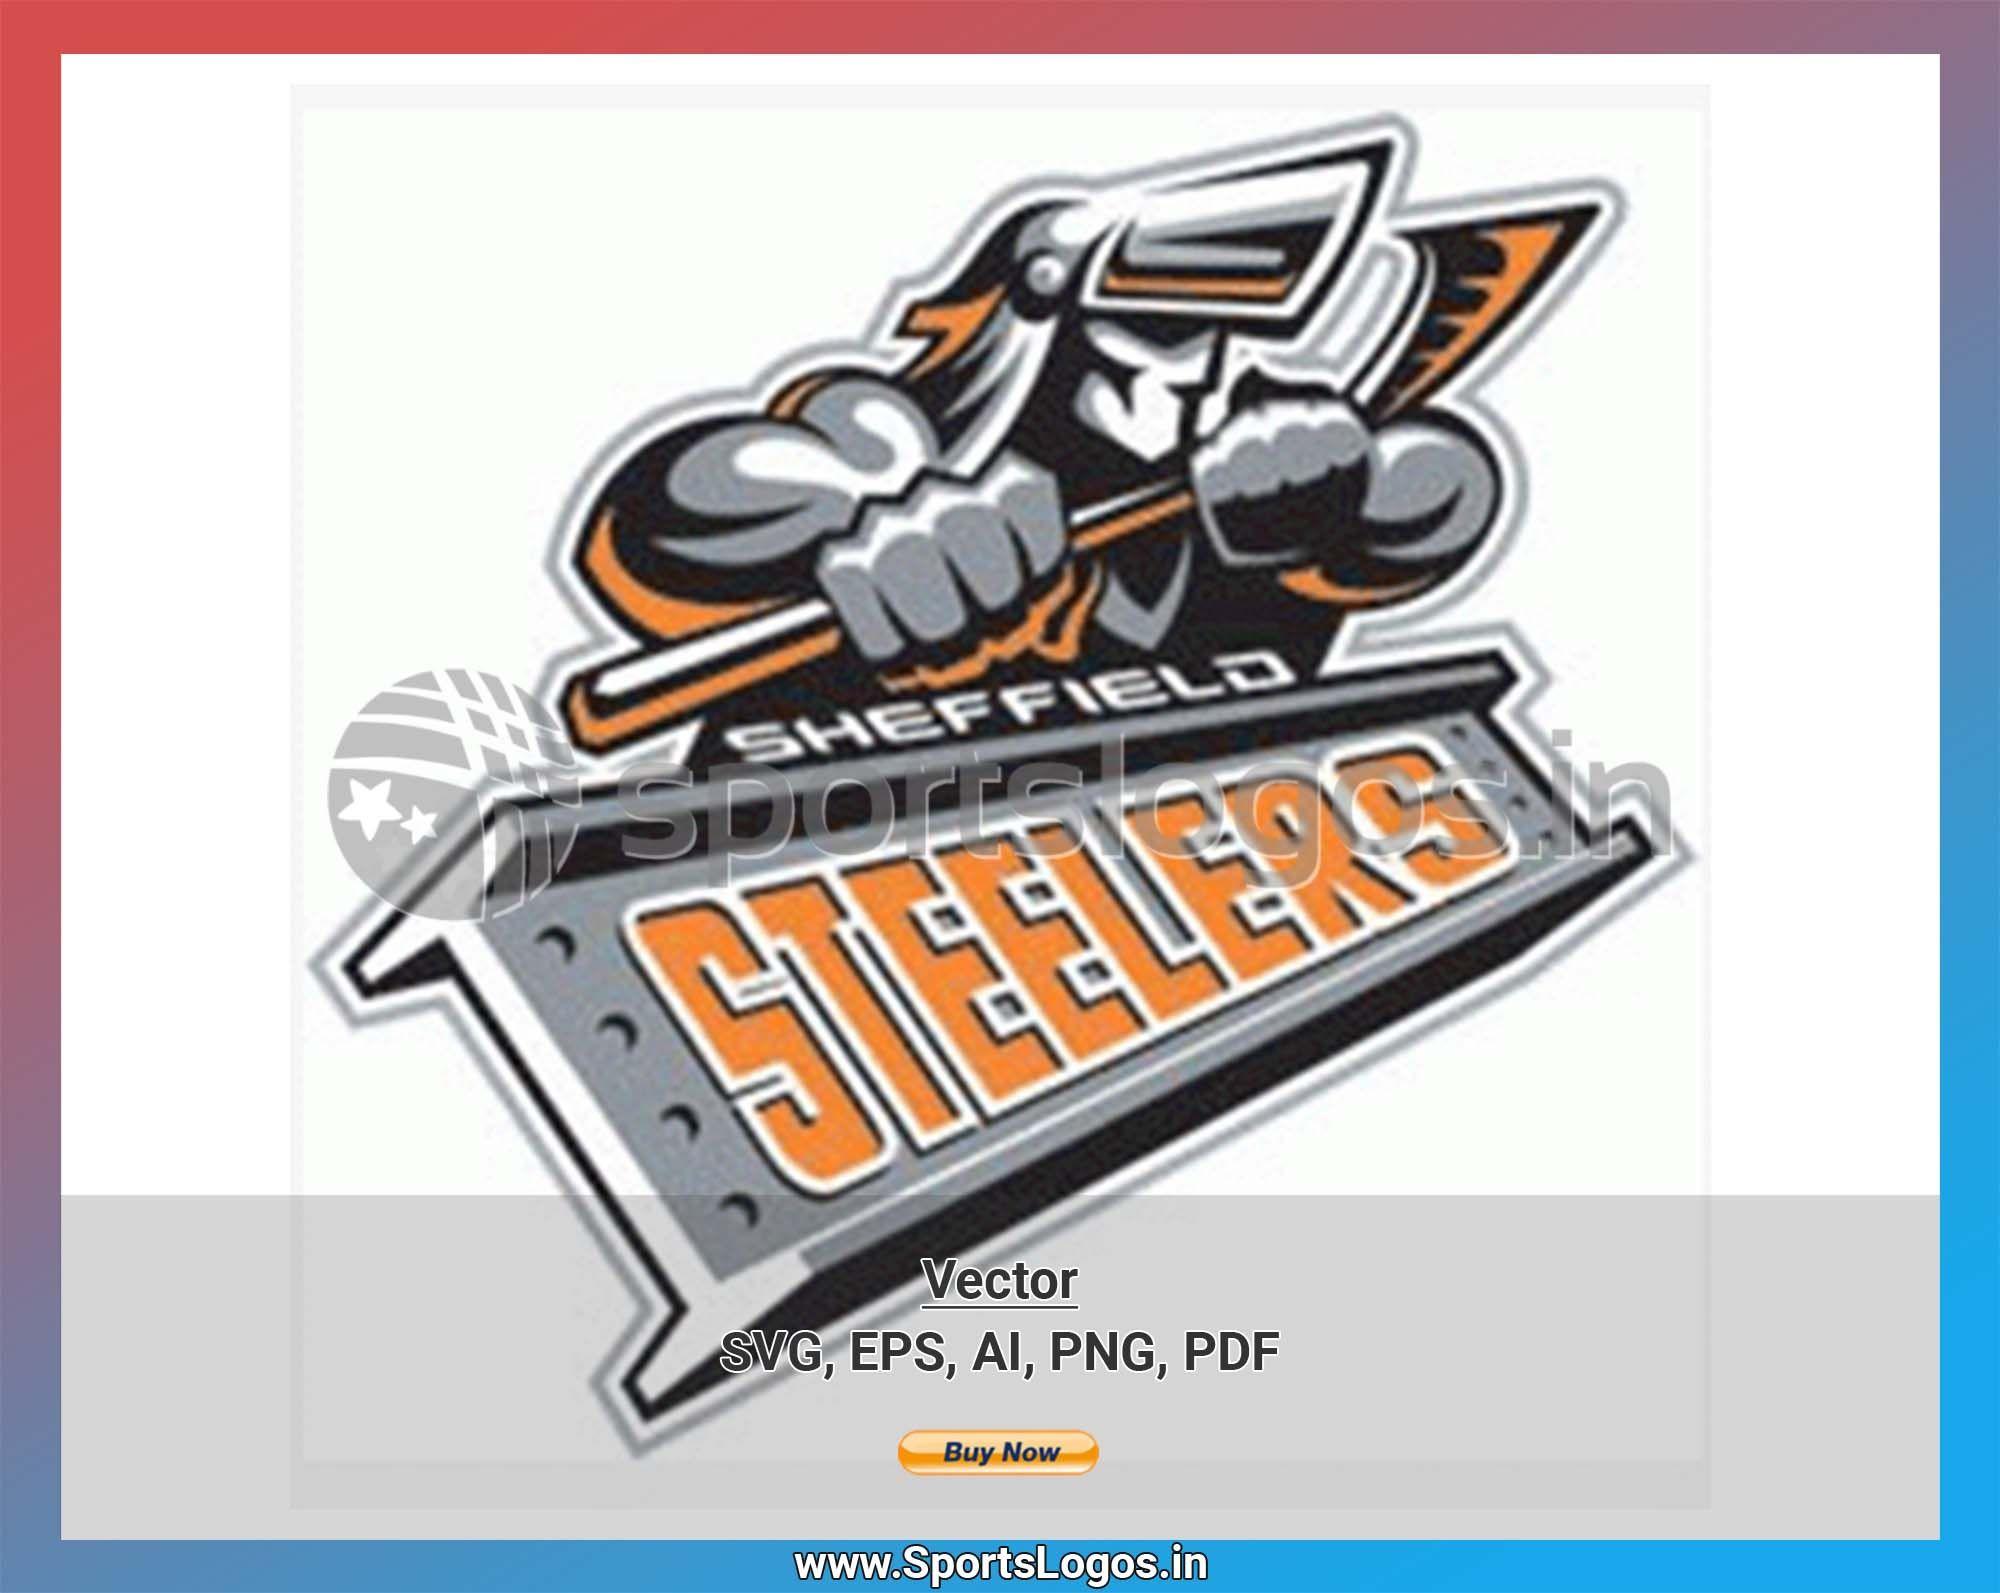 Sheffield Steelers Hockey Sports Vector SVG Logo in 5